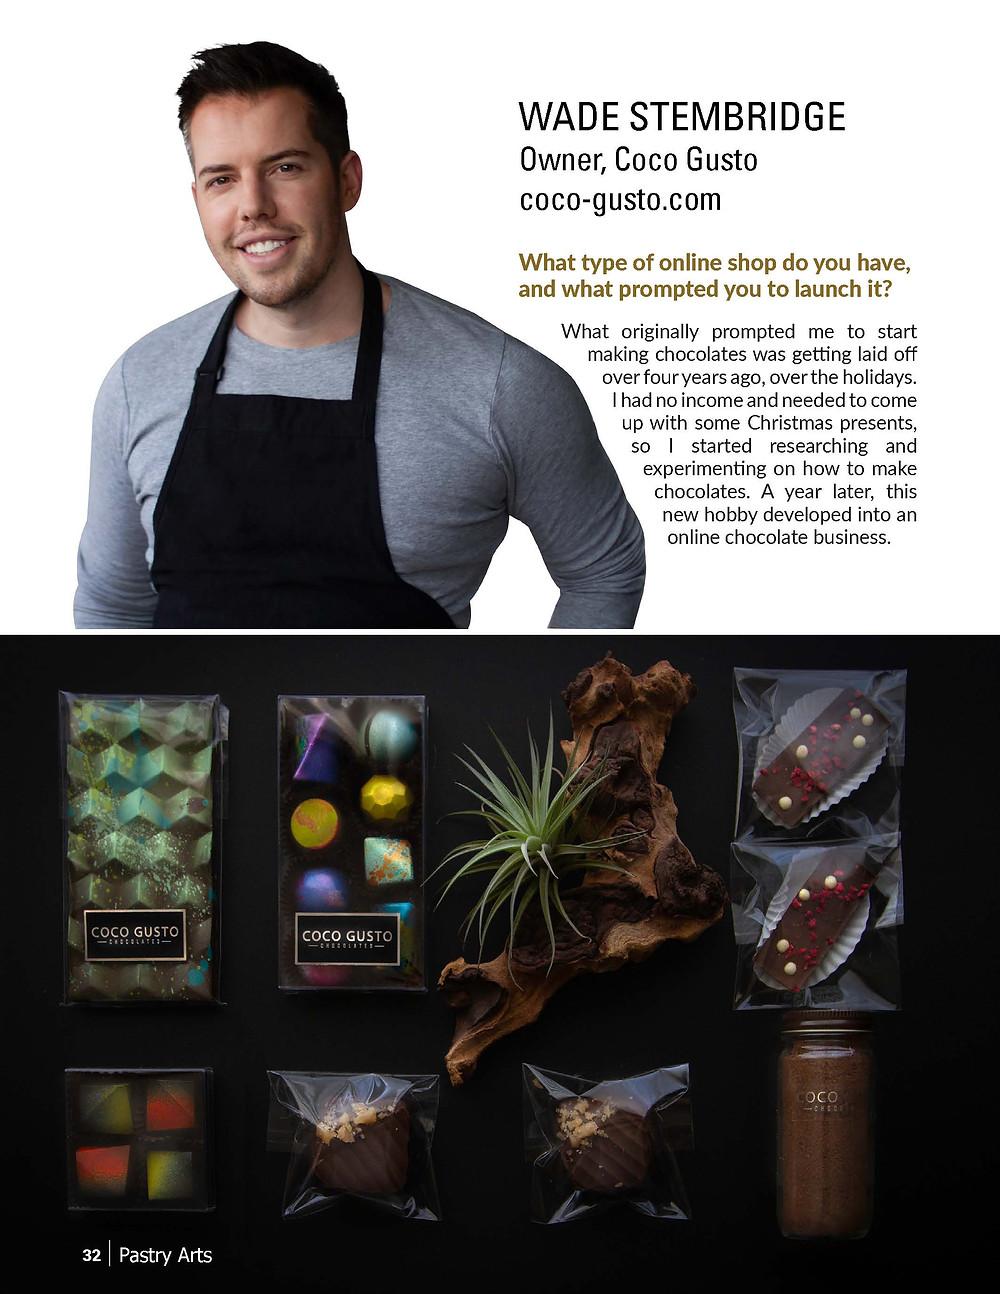 Wade Stembridge - Coco Gusto Colorado Artisan Chocolate Shop